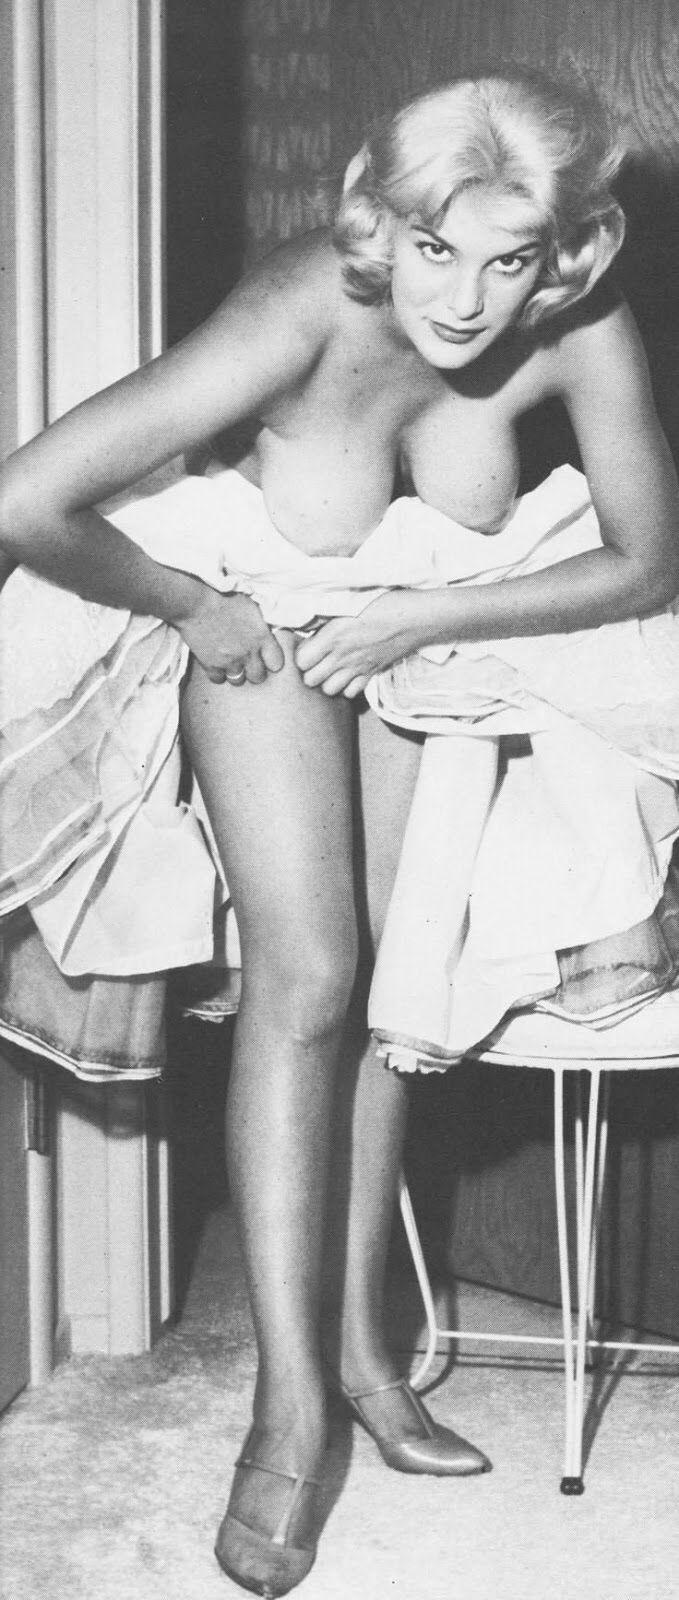 Consider, penny singleton nude pics for